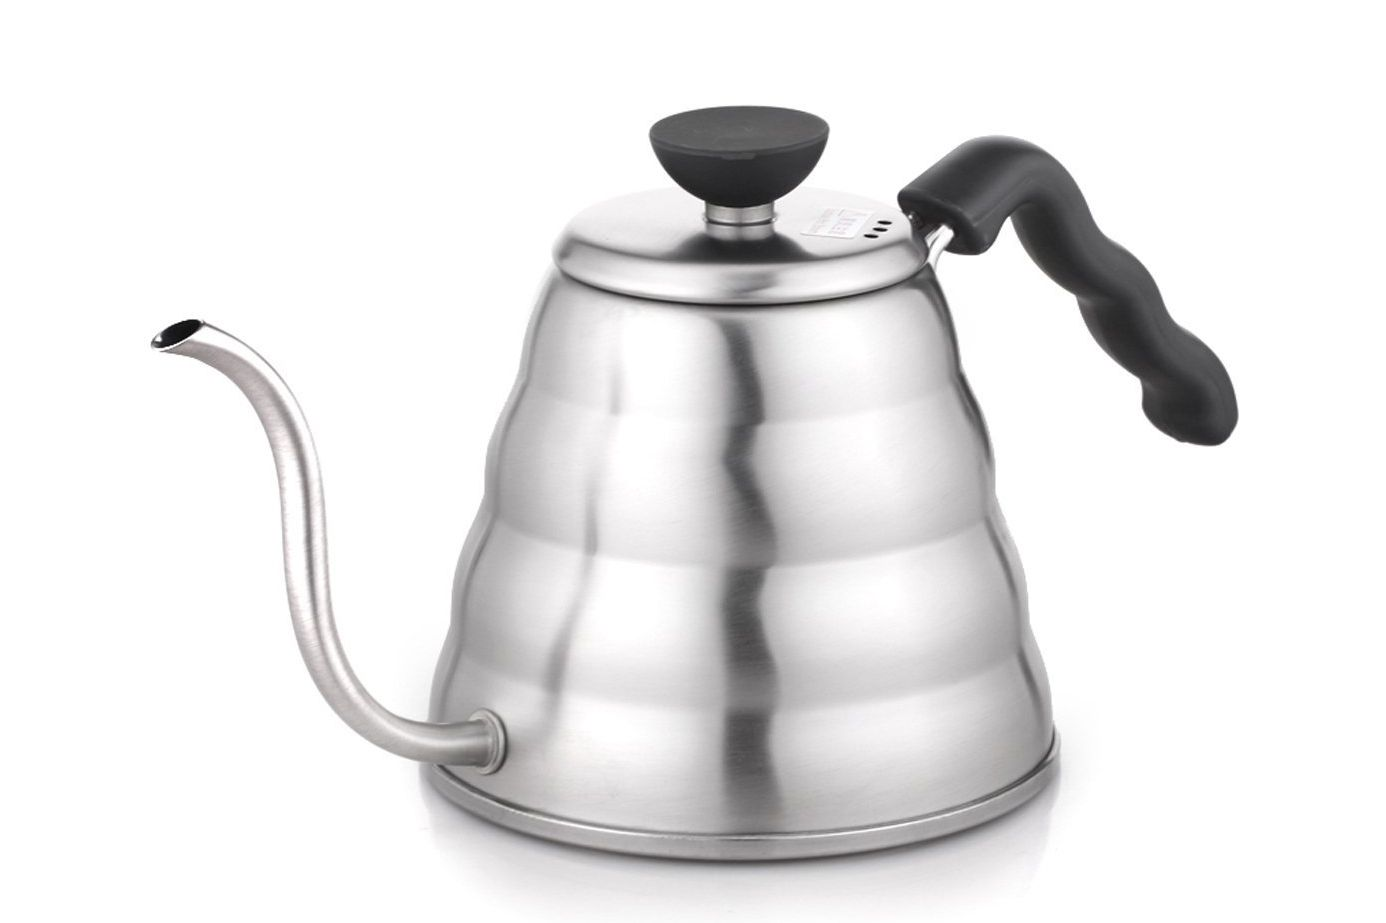 Hario V60 Buono Pouring Kettle